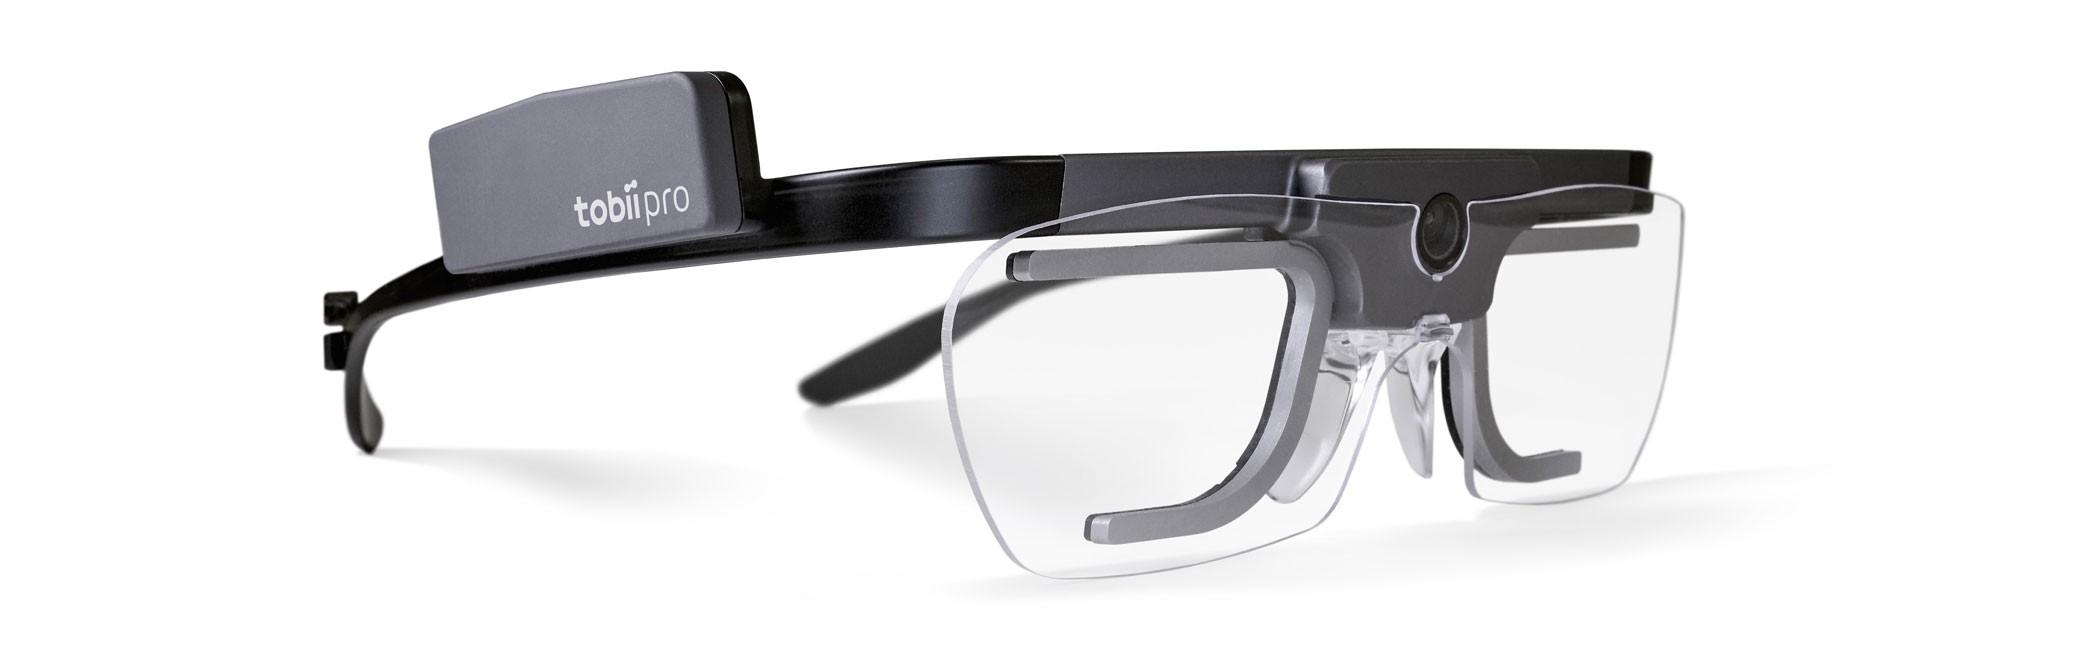 Tobii Pro Glasses 2, очки для айтрекинга